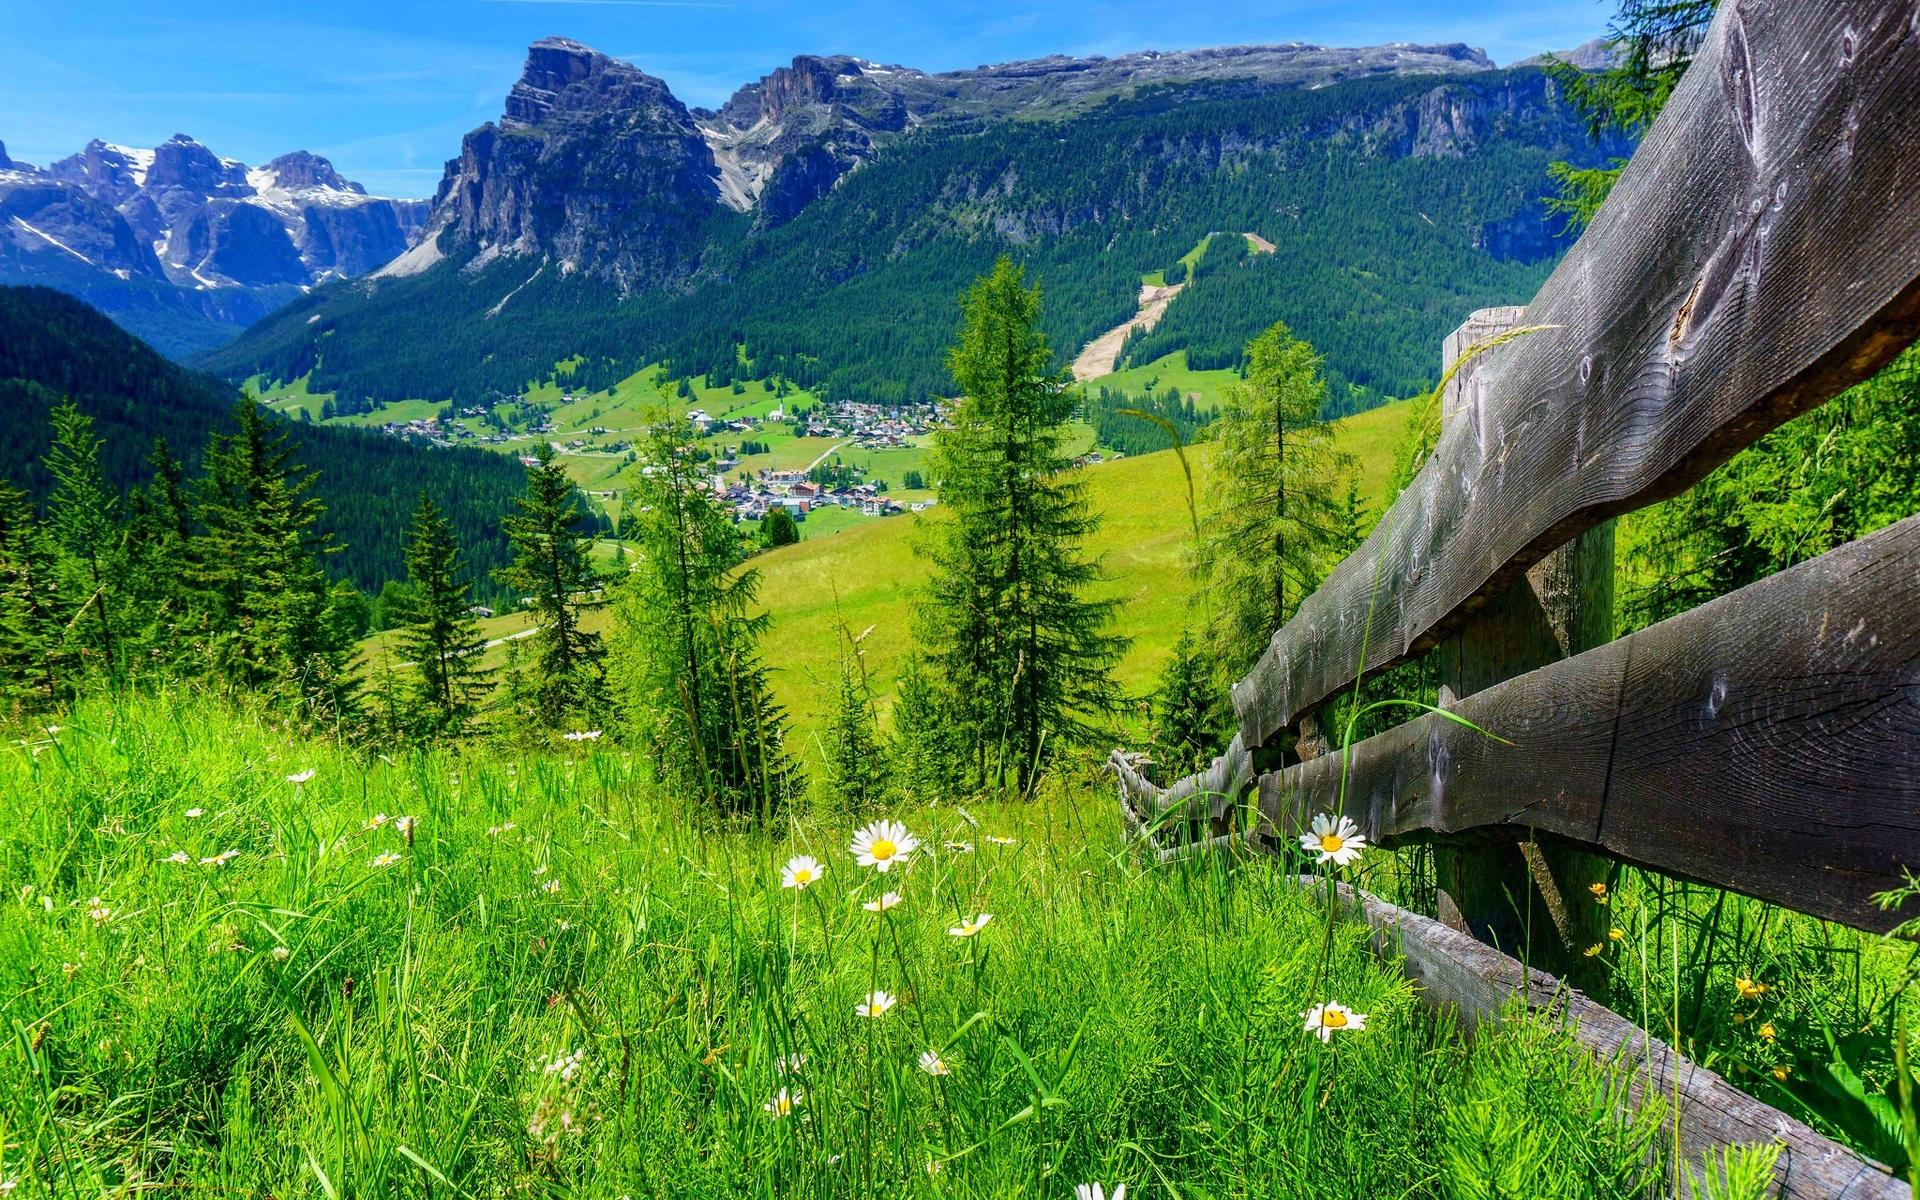 dorf haus gras blumen zaun b ume berge sommer